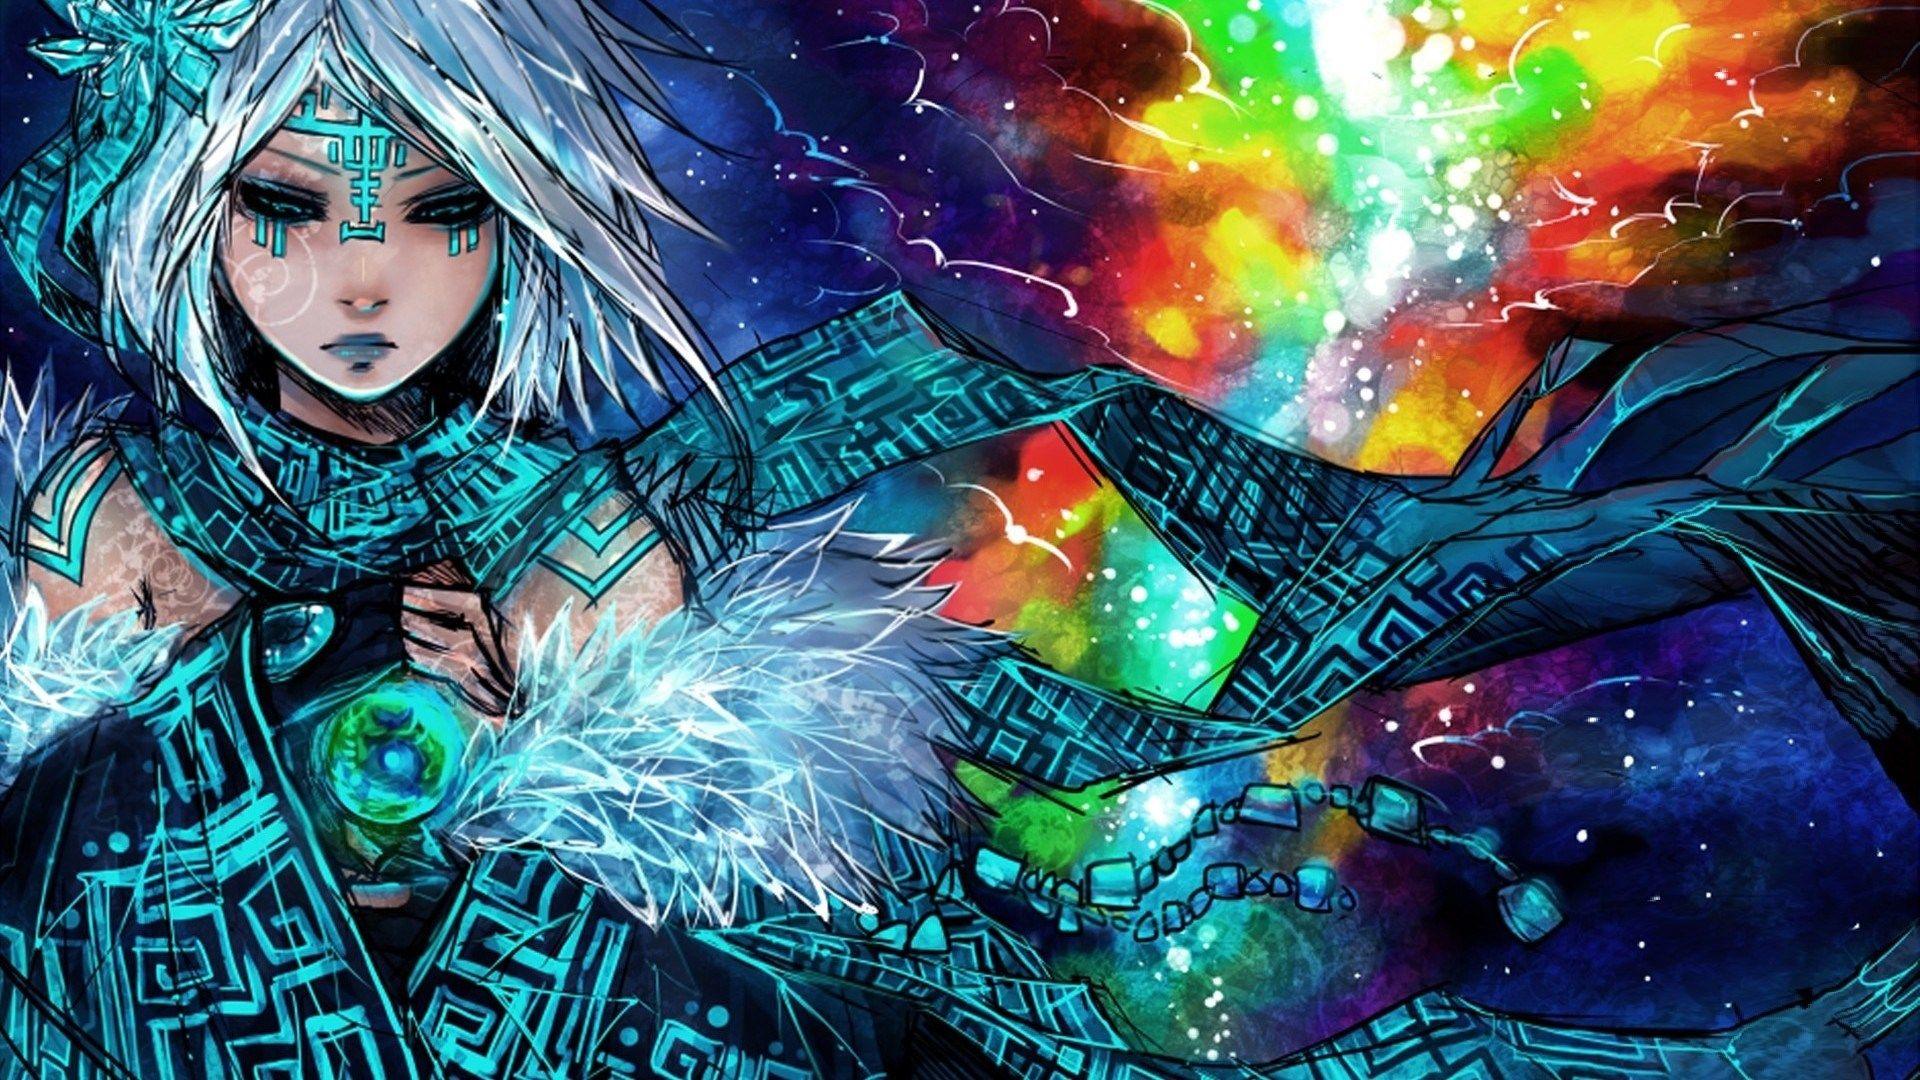 Tribal Mage Hd Anime Wallpaper Anime Wallpaper Hd Anime Wallpapers Anime